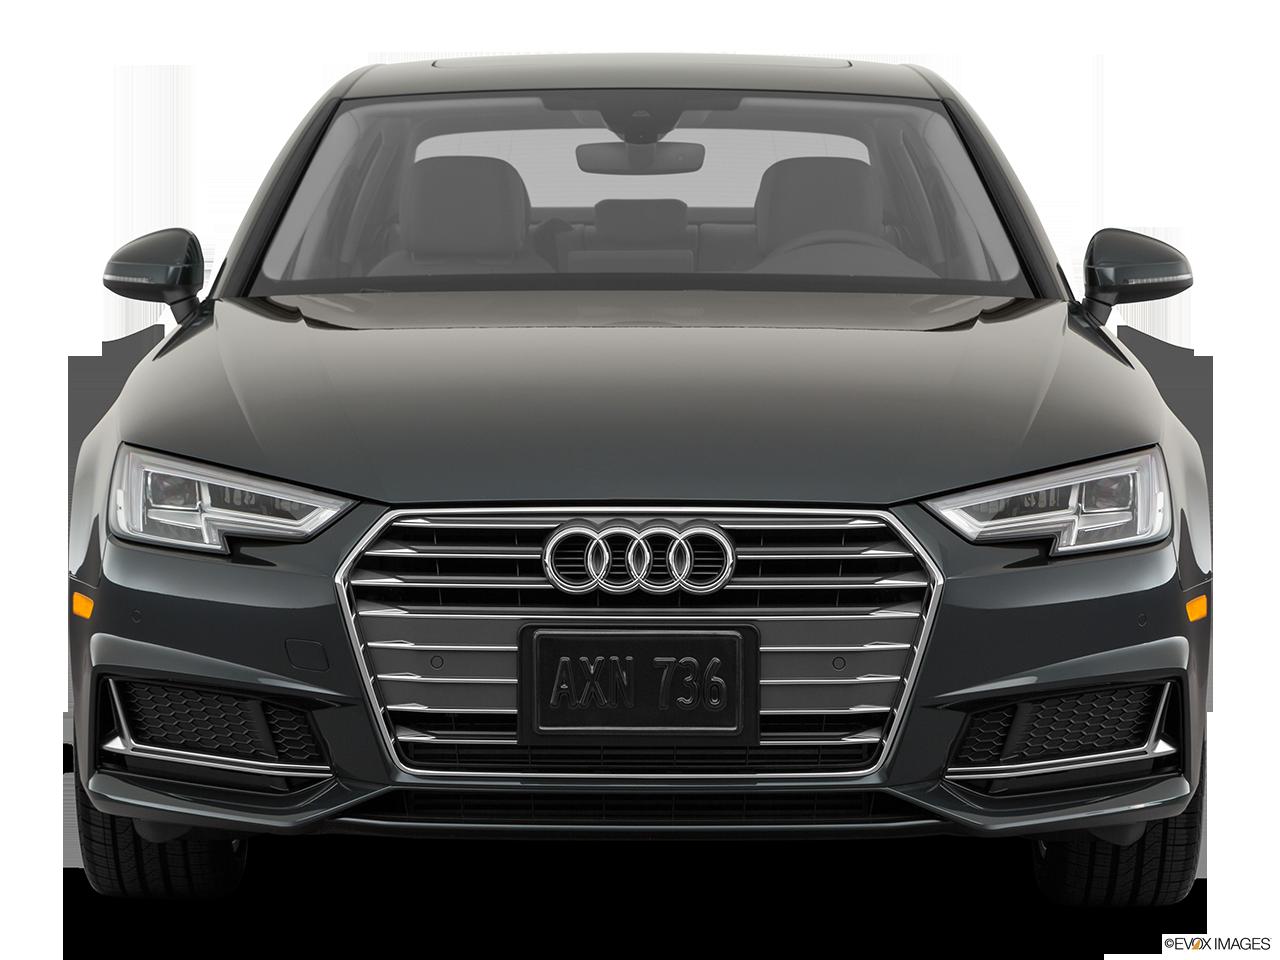 2019 Audi A4 photo